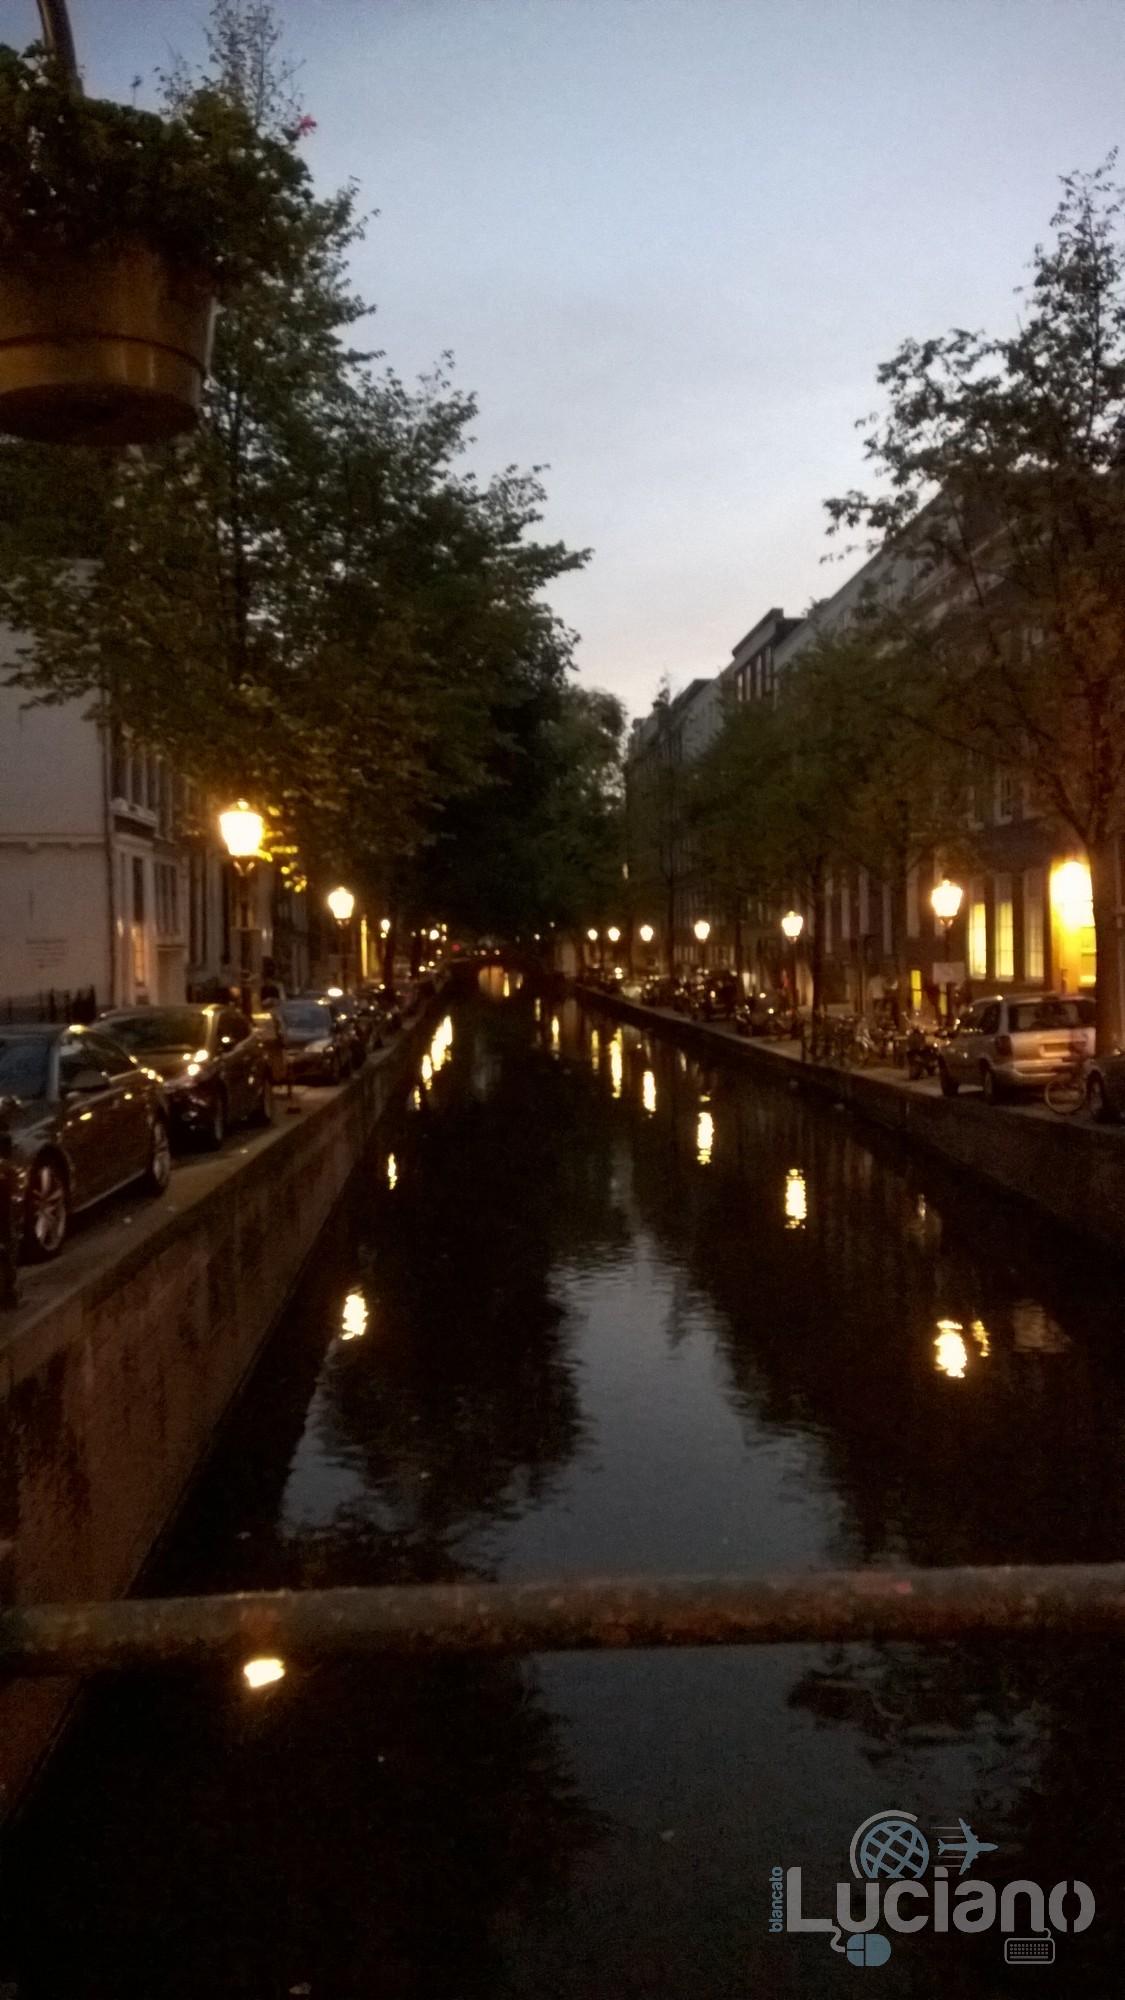 amsterdam-2014-vueling-lucianoblancatoit (46)